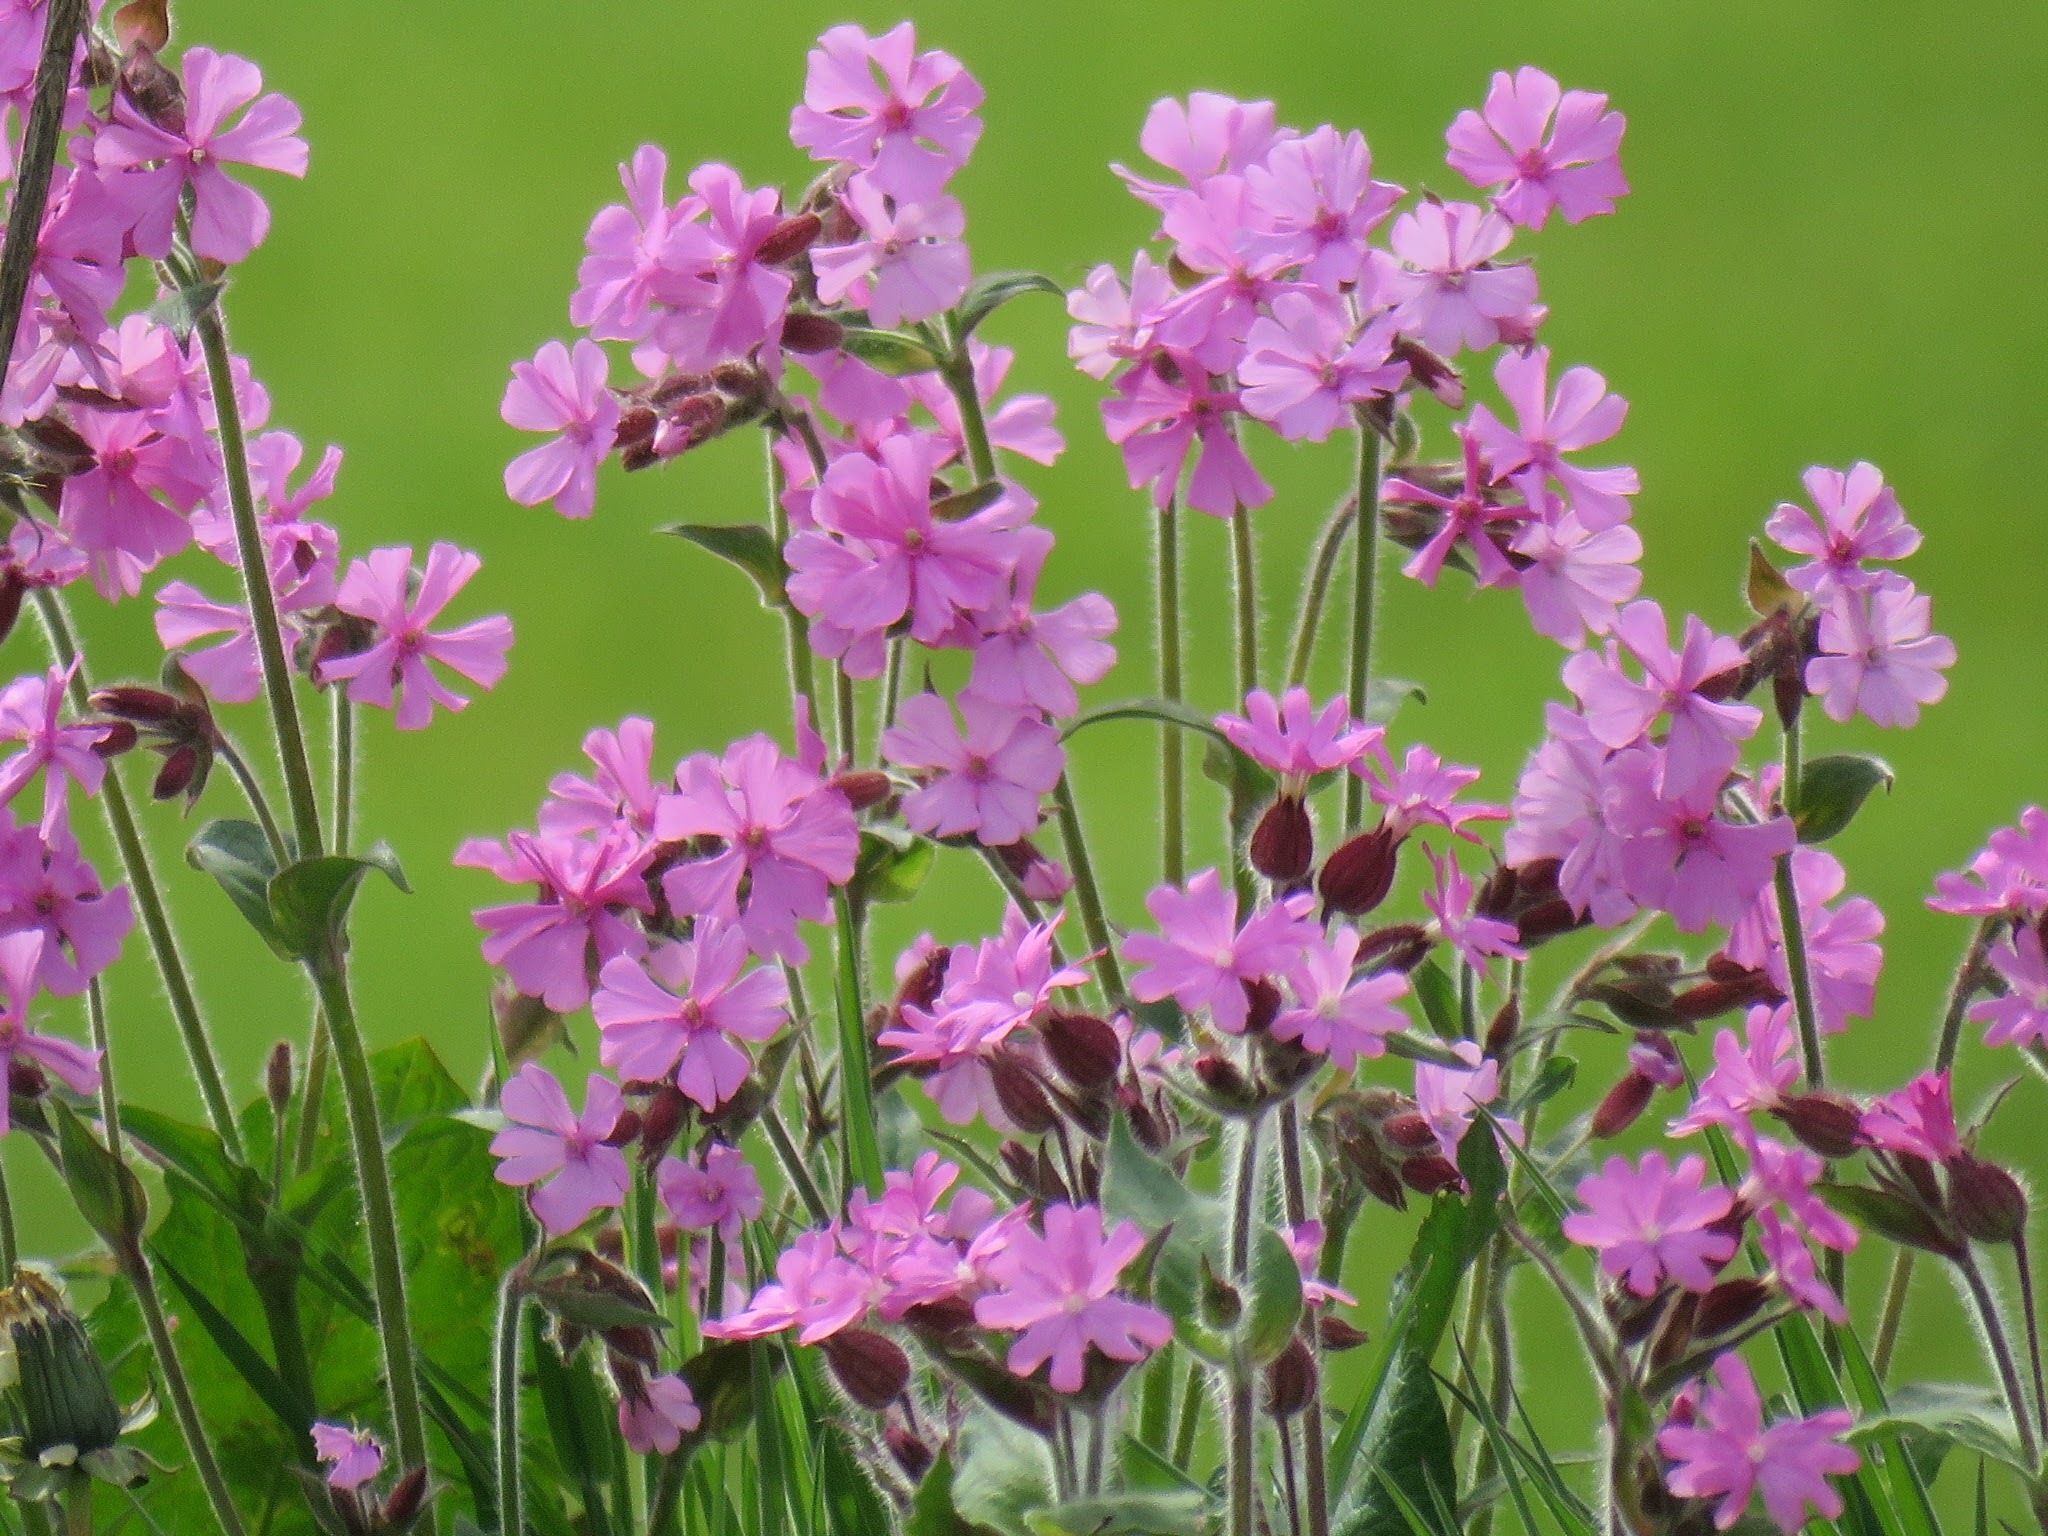 #Wild flowers by marit